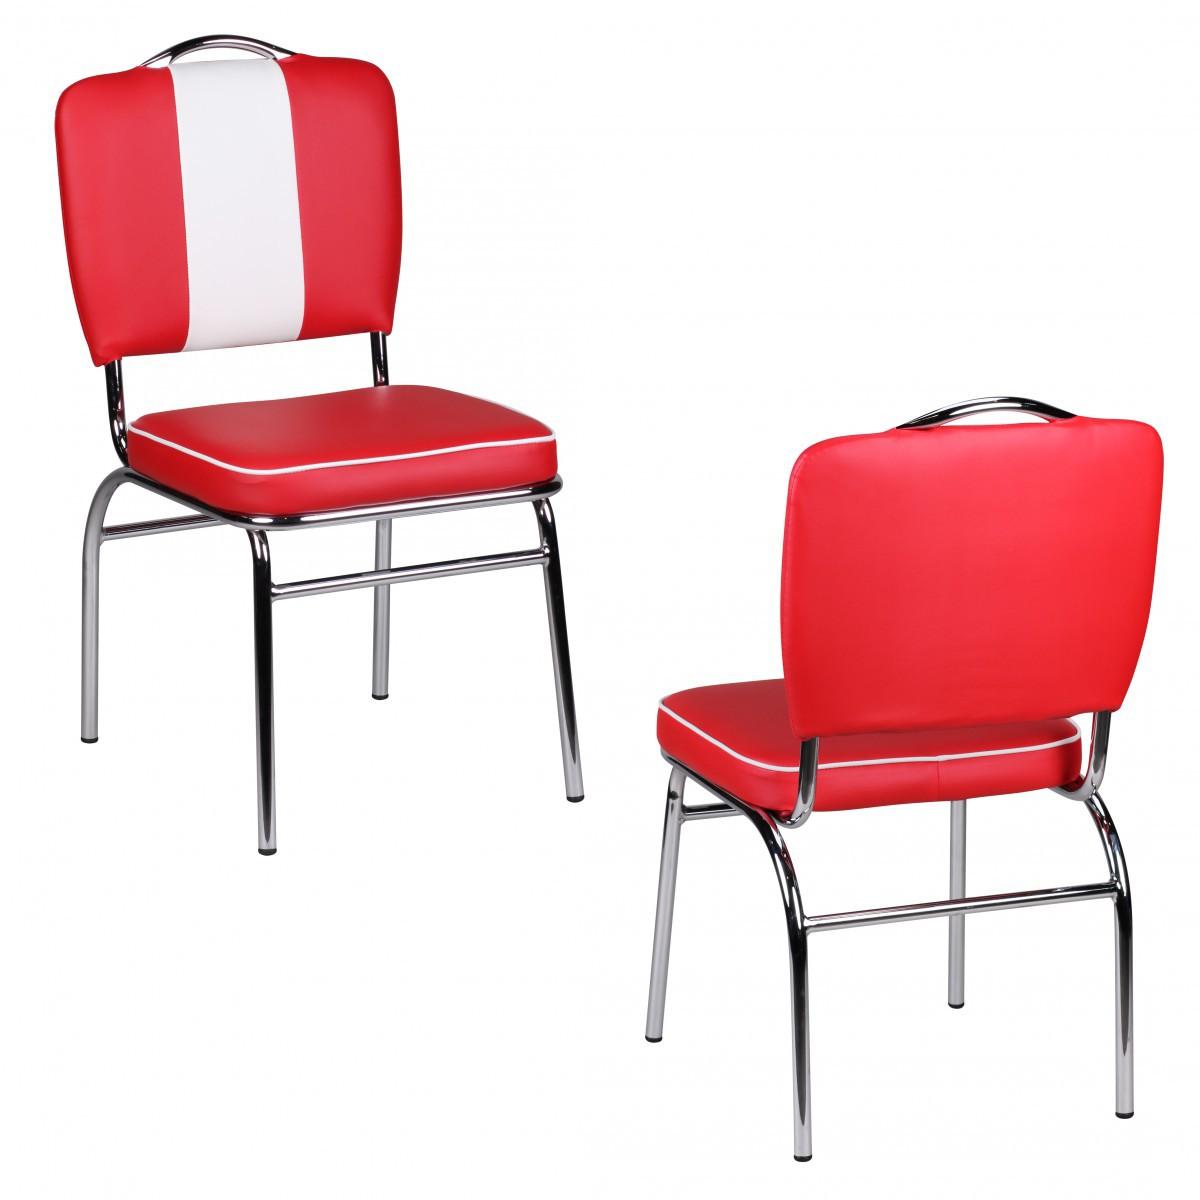 2er Set Esszimmerstühle American Diner Stühle 50er Jahre Retro Möbel Bistro